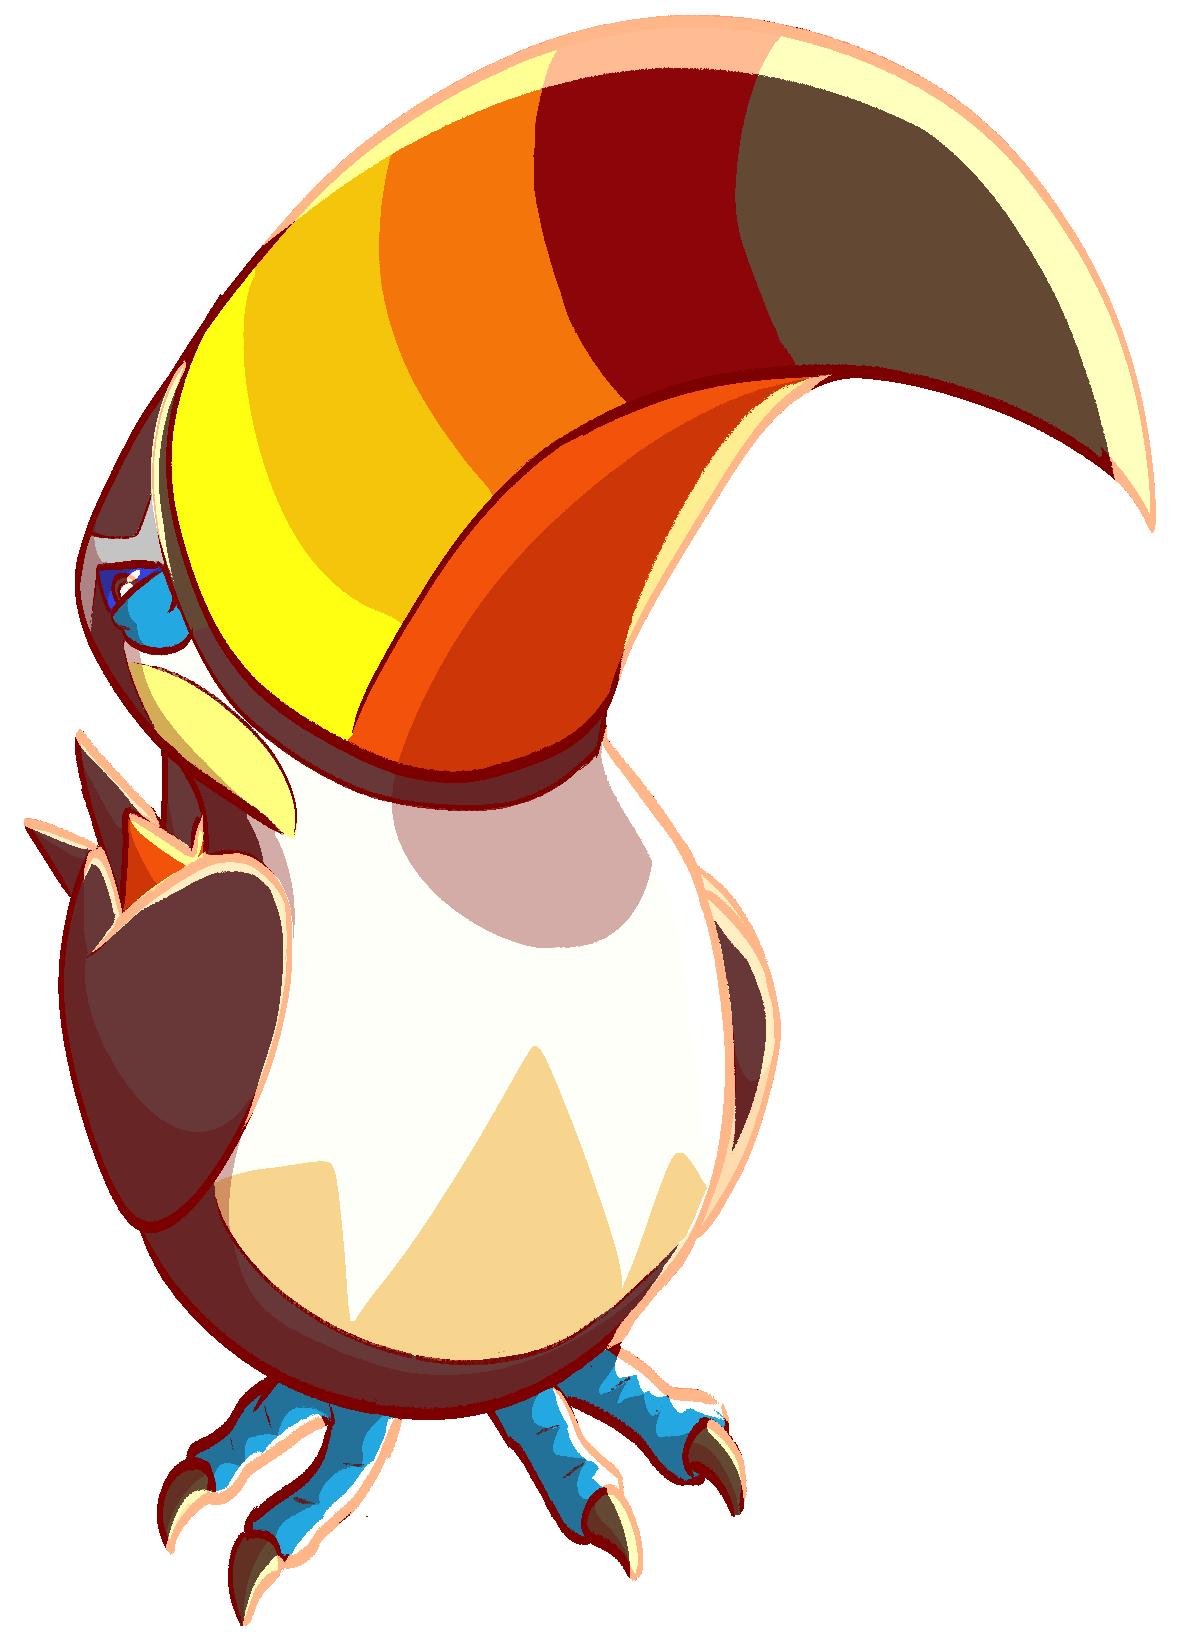 Sun and moon symbol clipart clip transparent stock Toucannon | Pokémon Sun and Moon | Know Your Meme clip transparent stock